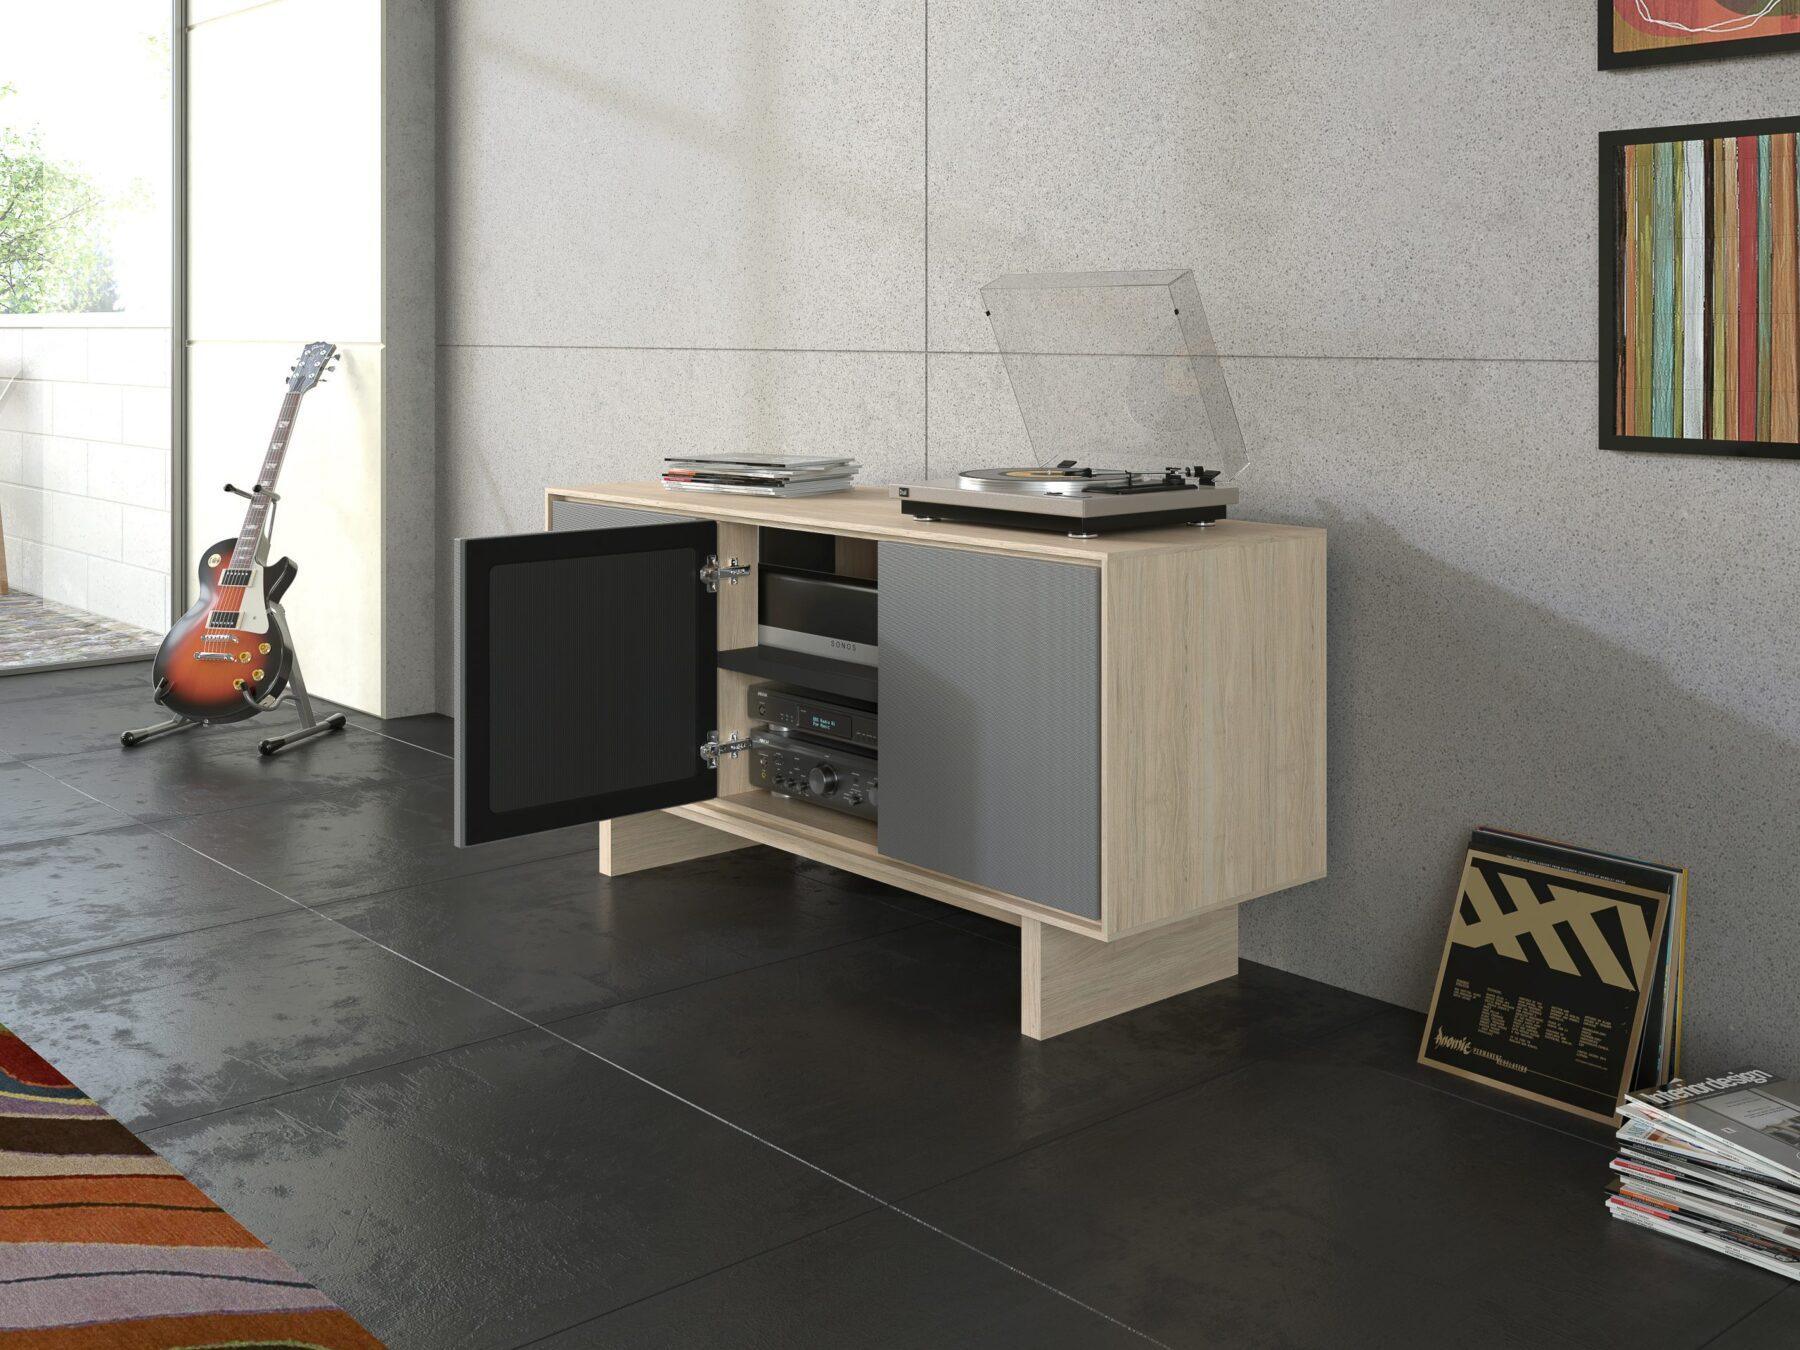 octave-media-cabinet-BDI-8377GFL-drift-oak-2